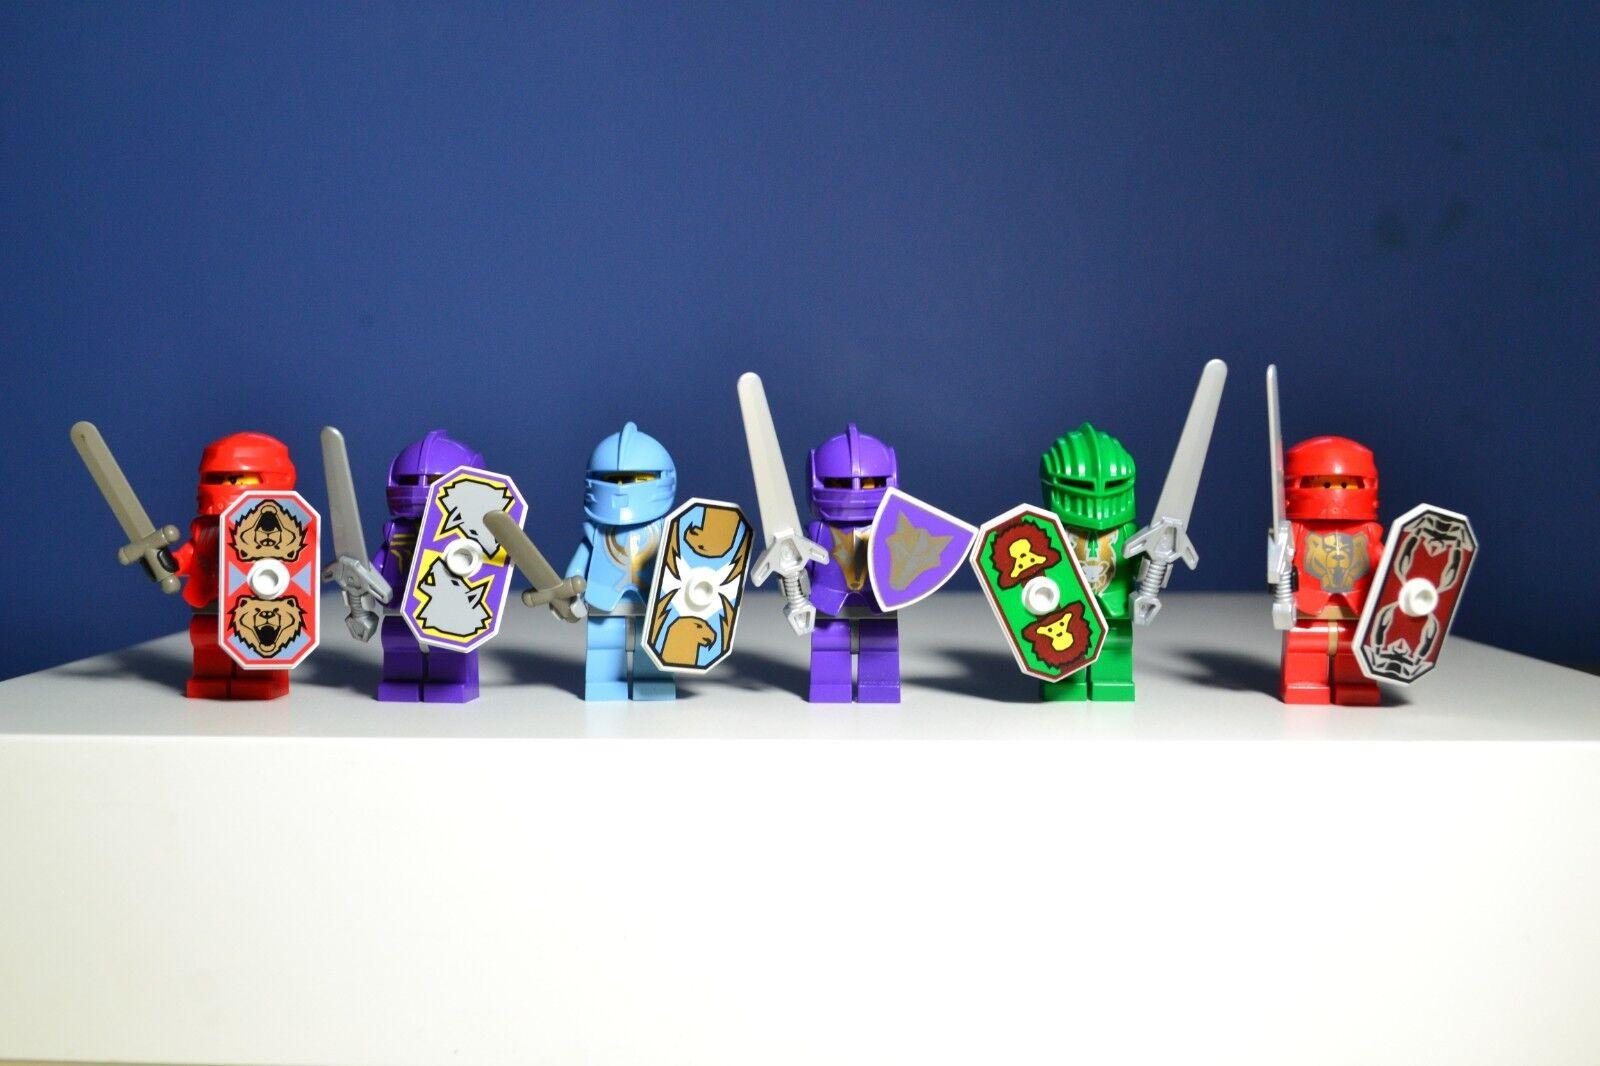 LEGO Castle Knights Kingdom II Santis Minifigures Lot Of 6  8801 8873 8877